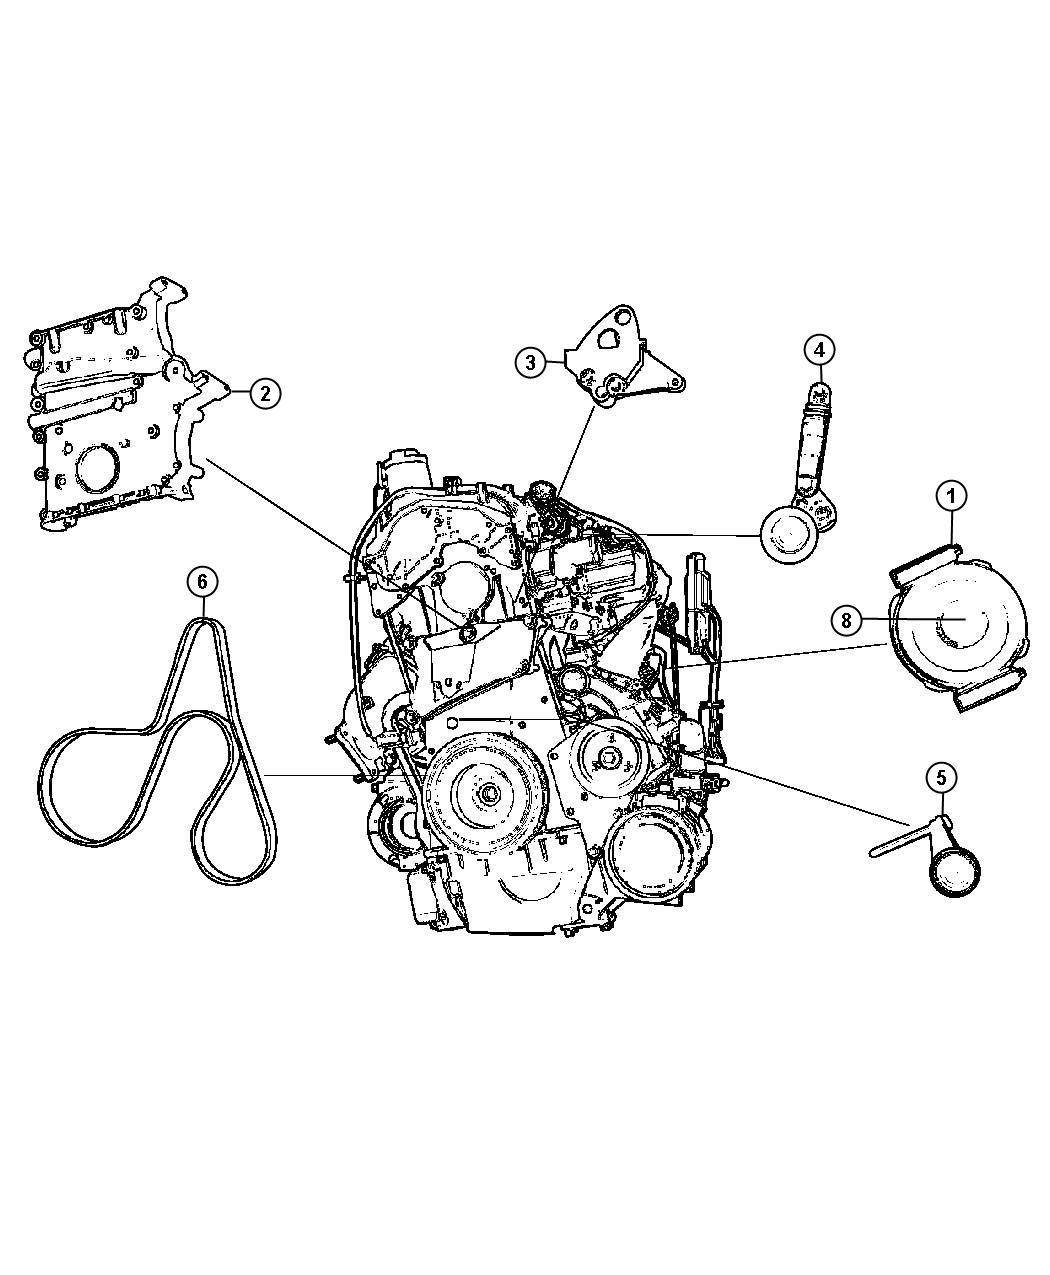 Dodge Sprinter Pulley  Alternator  90 Amp  Except 150 Amp